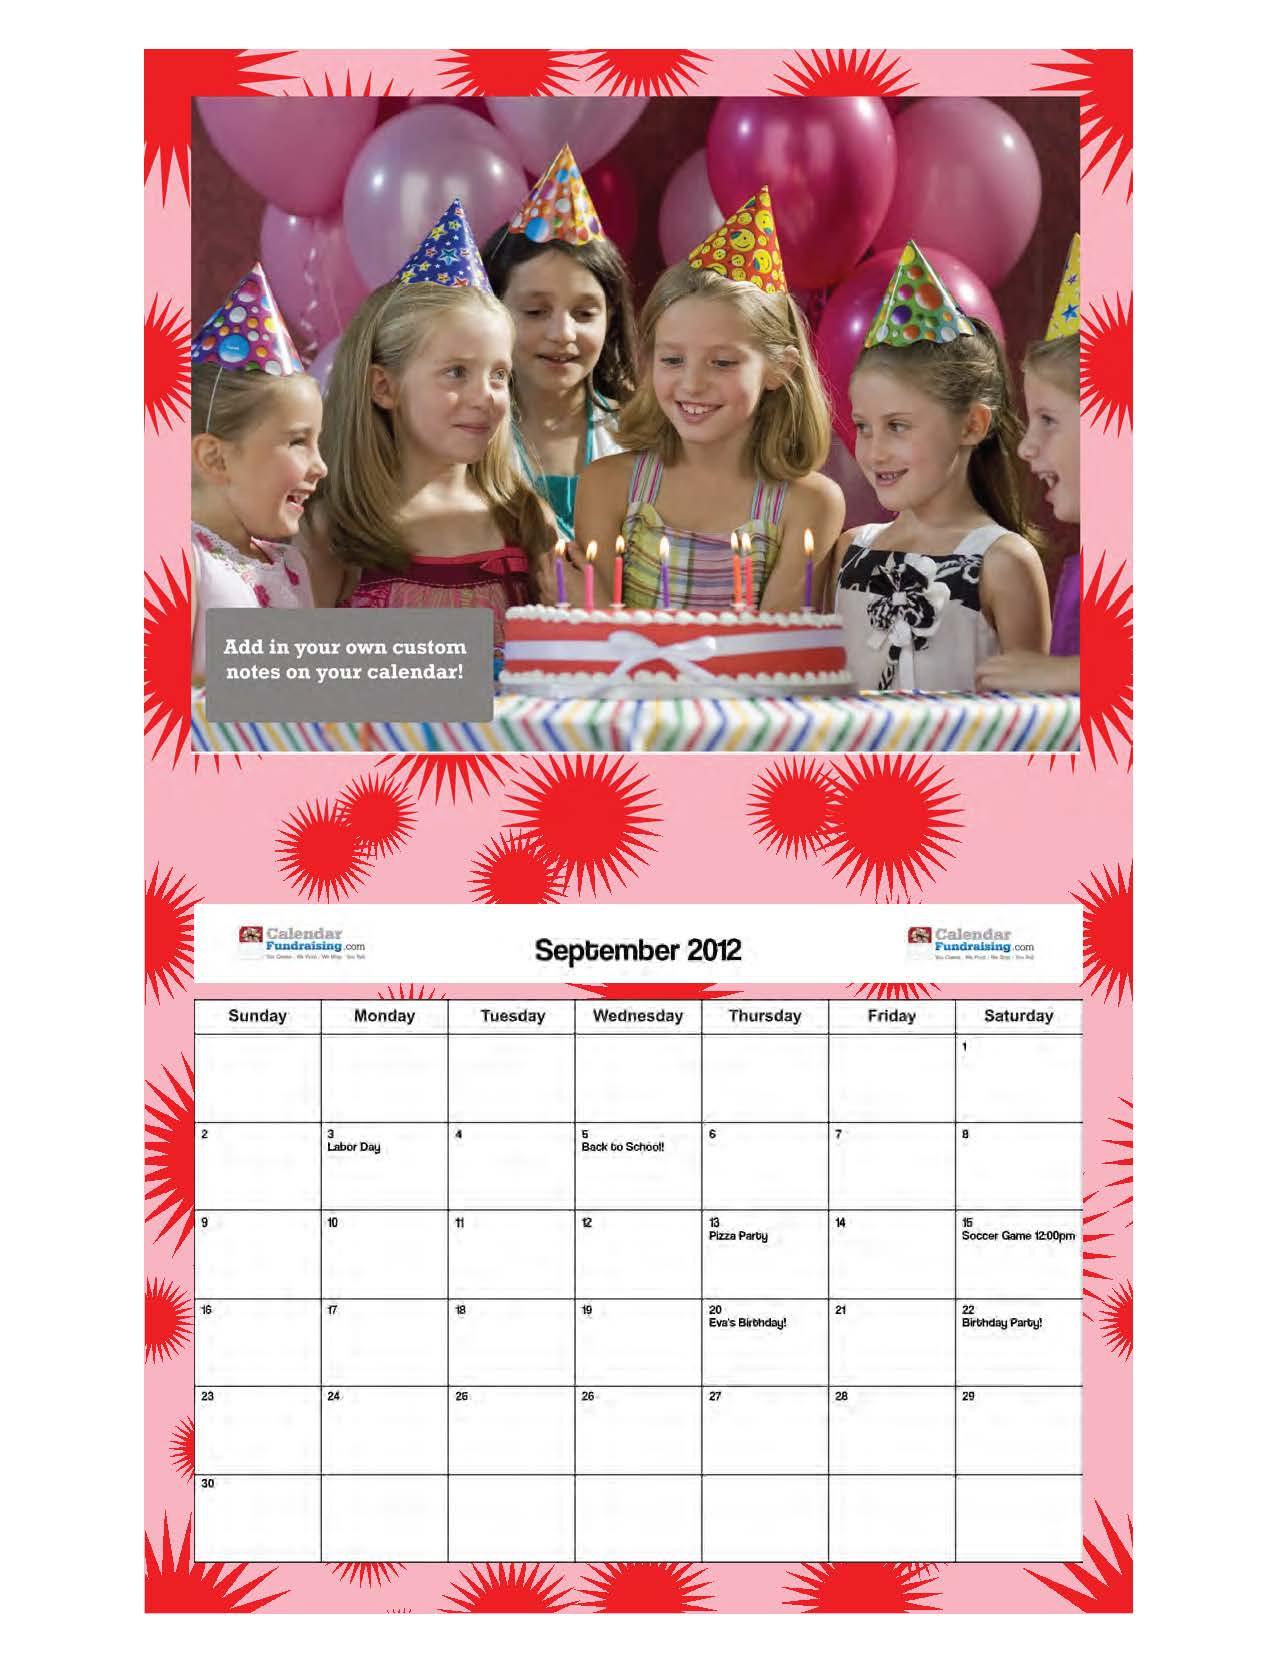 Copyright 2018 Calendar Fundraising